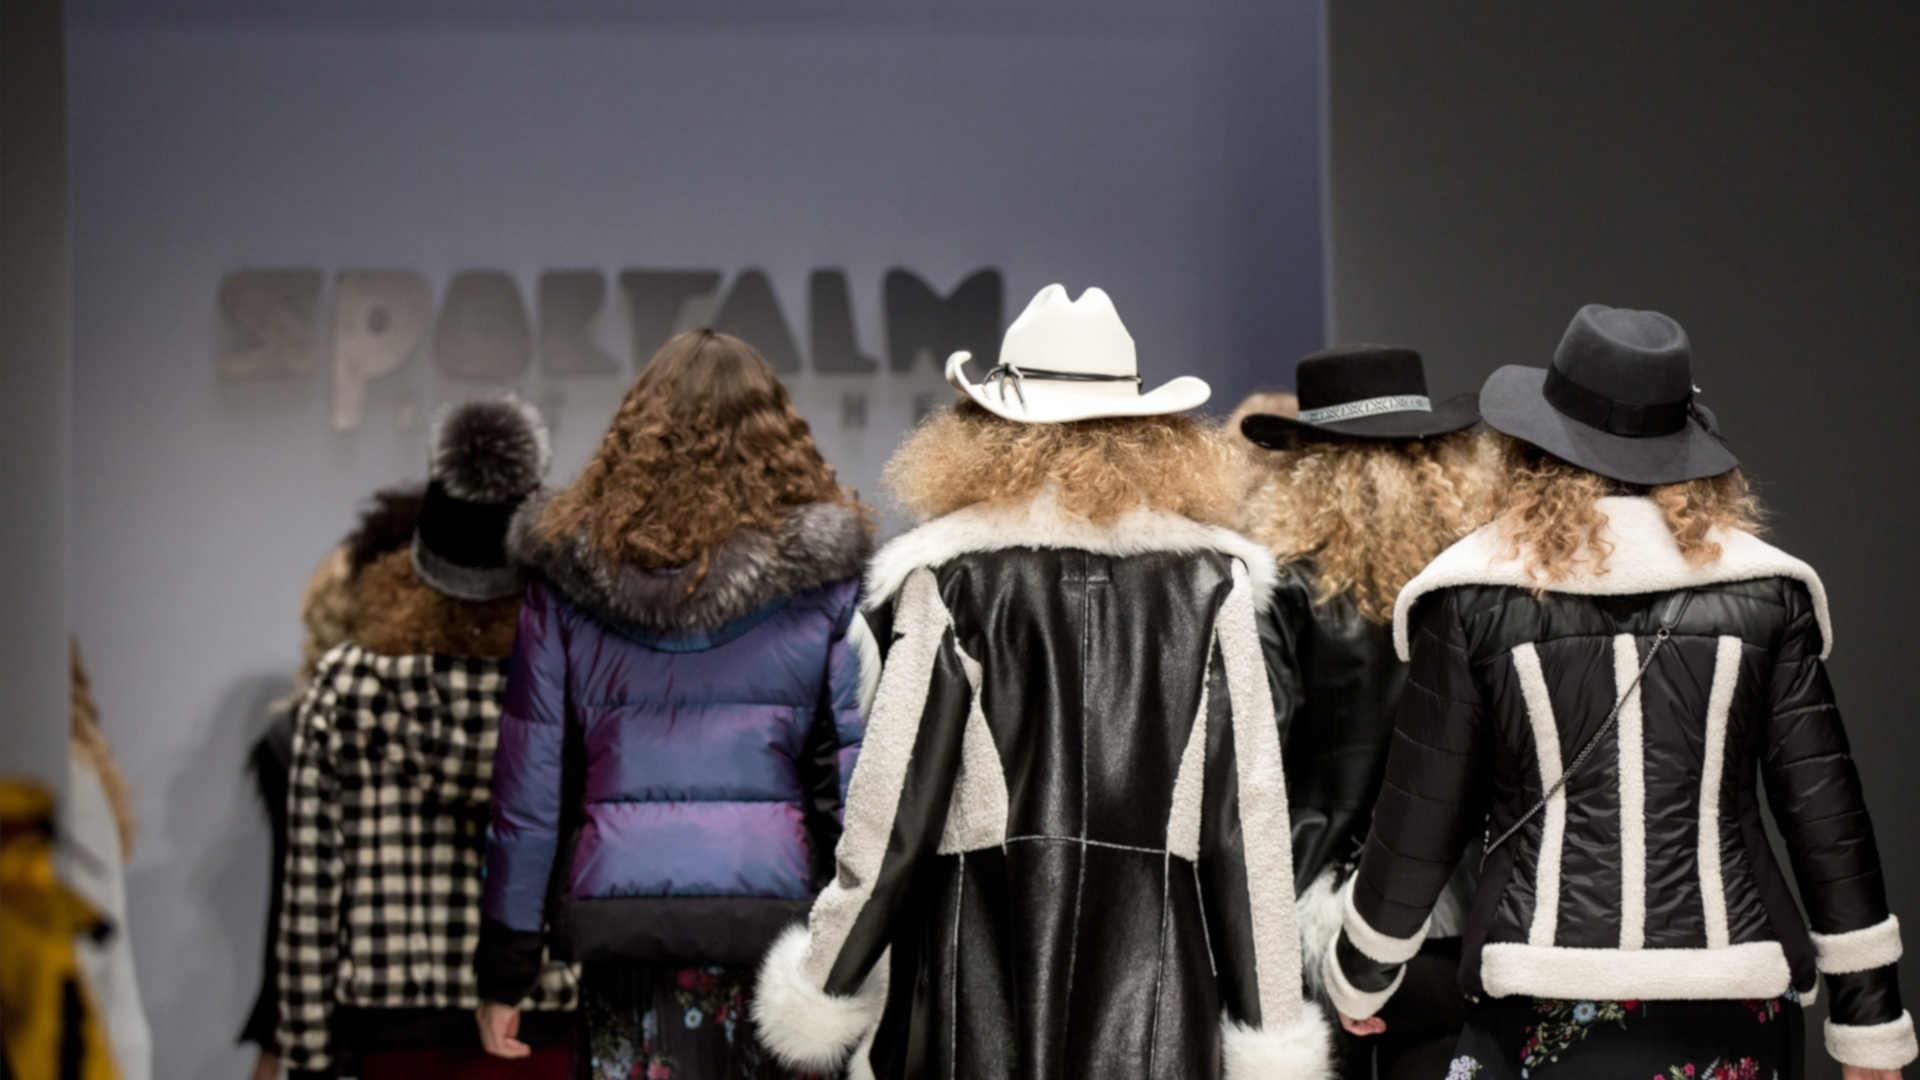 Beauty-Expert-Mercedes-Benz-Fashion-Week-Berlin-Ark-Argenta-3